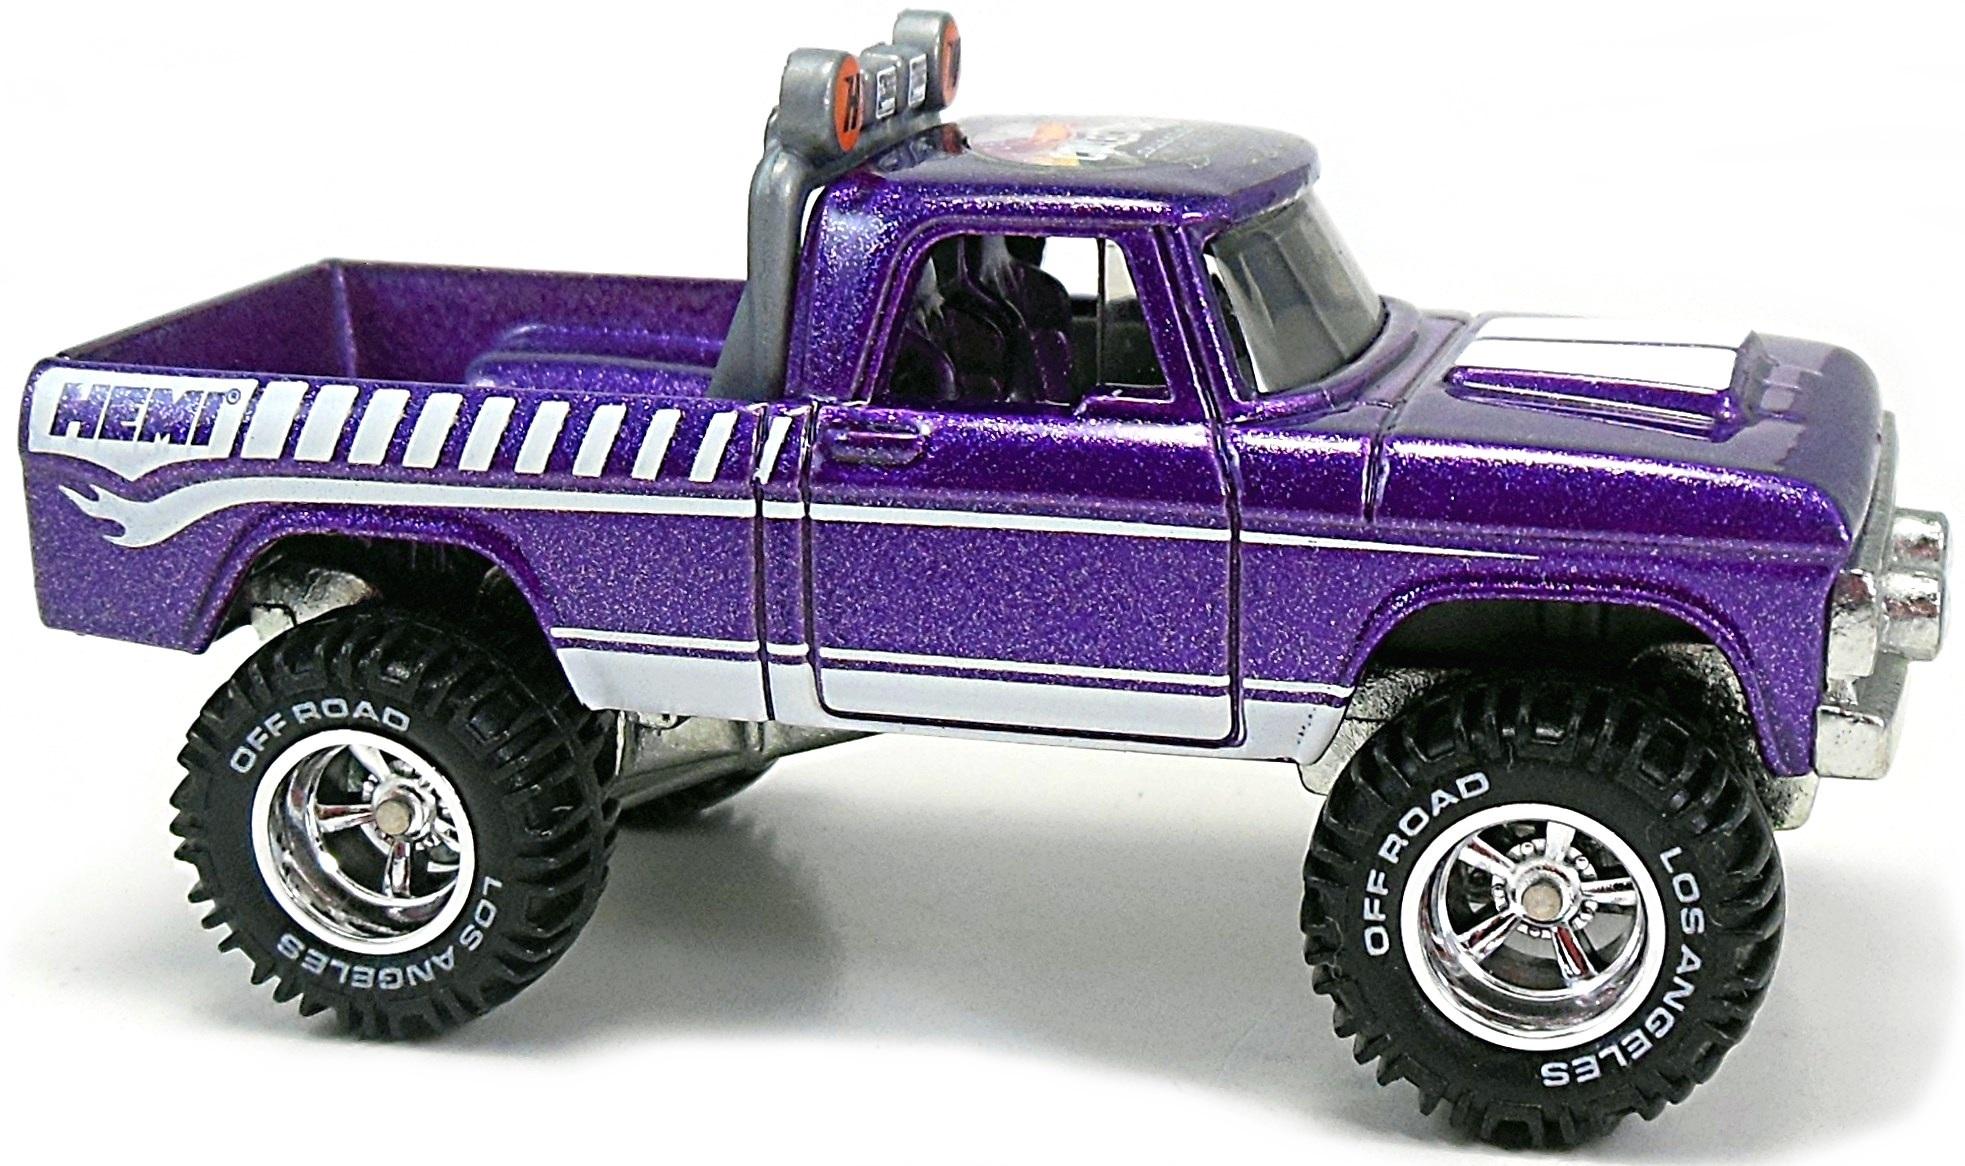 70 Dodge Power Wagon – 74mm – 2011 | Hot Wheels Newsletter